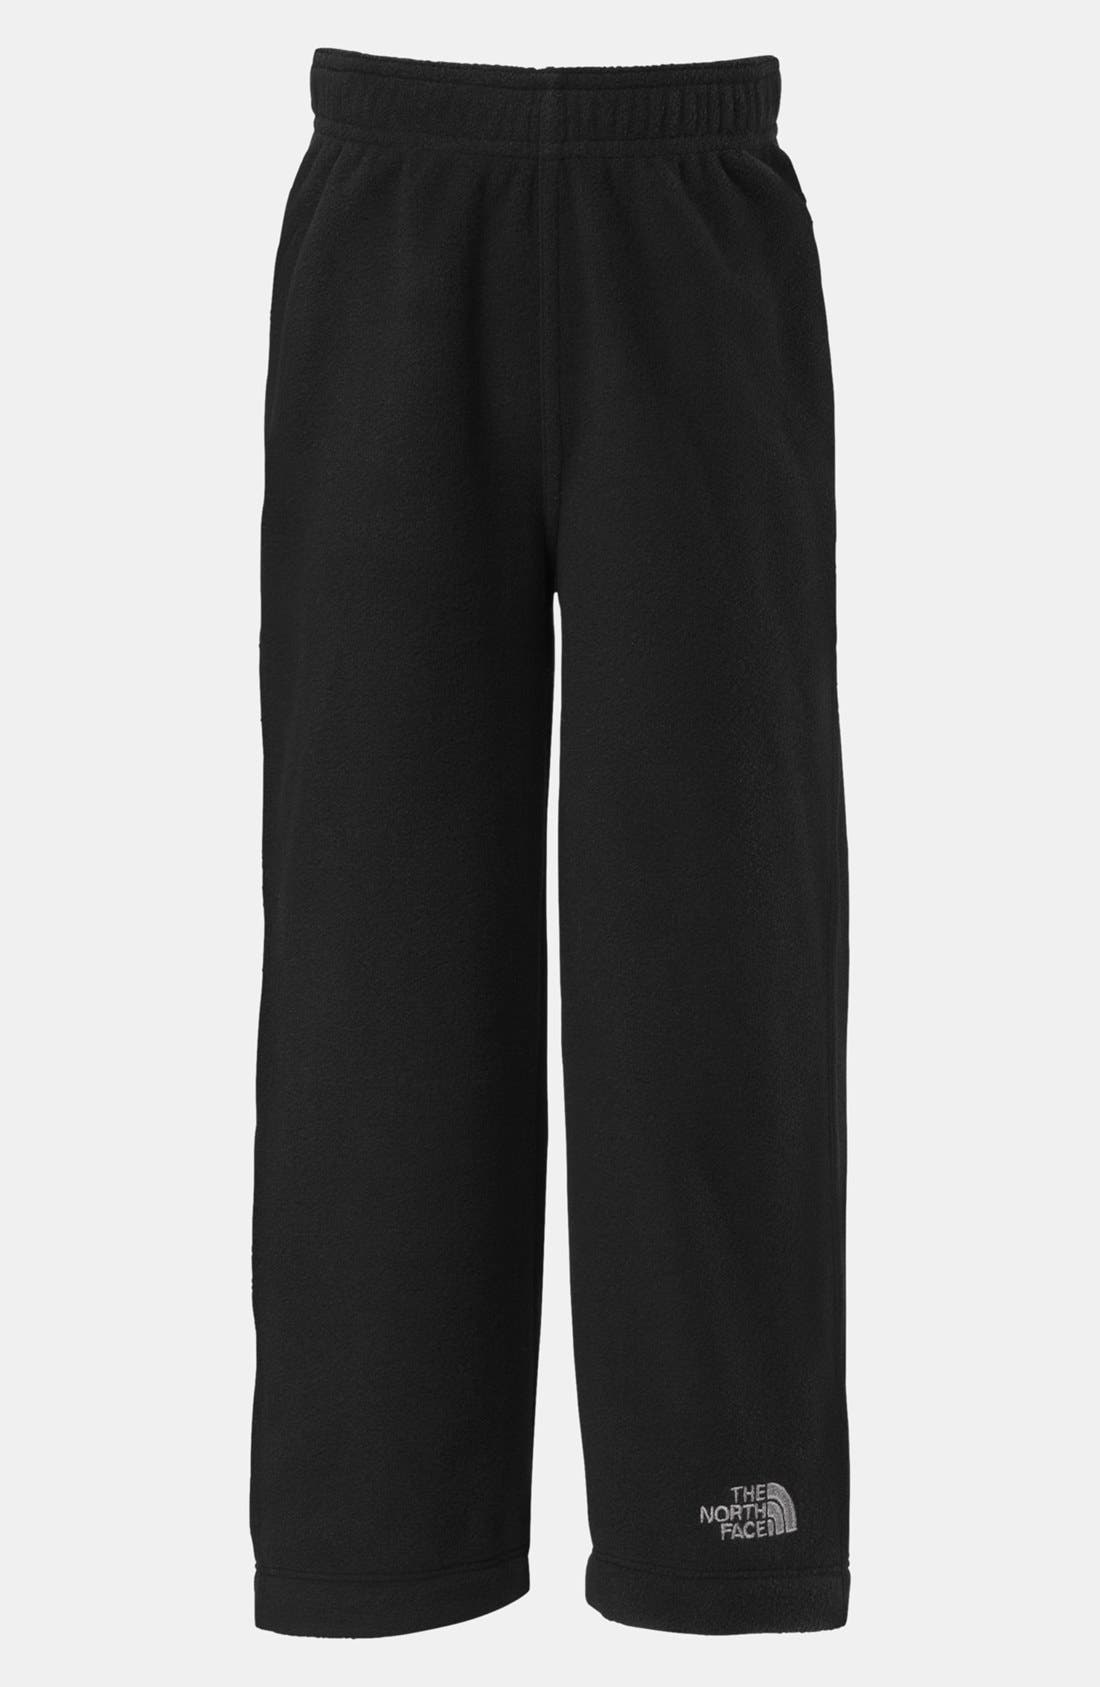 Alternate Image 1 Selected - The North Face 'Glacier' Polartec® Fleece Pants (Toddler Boys)